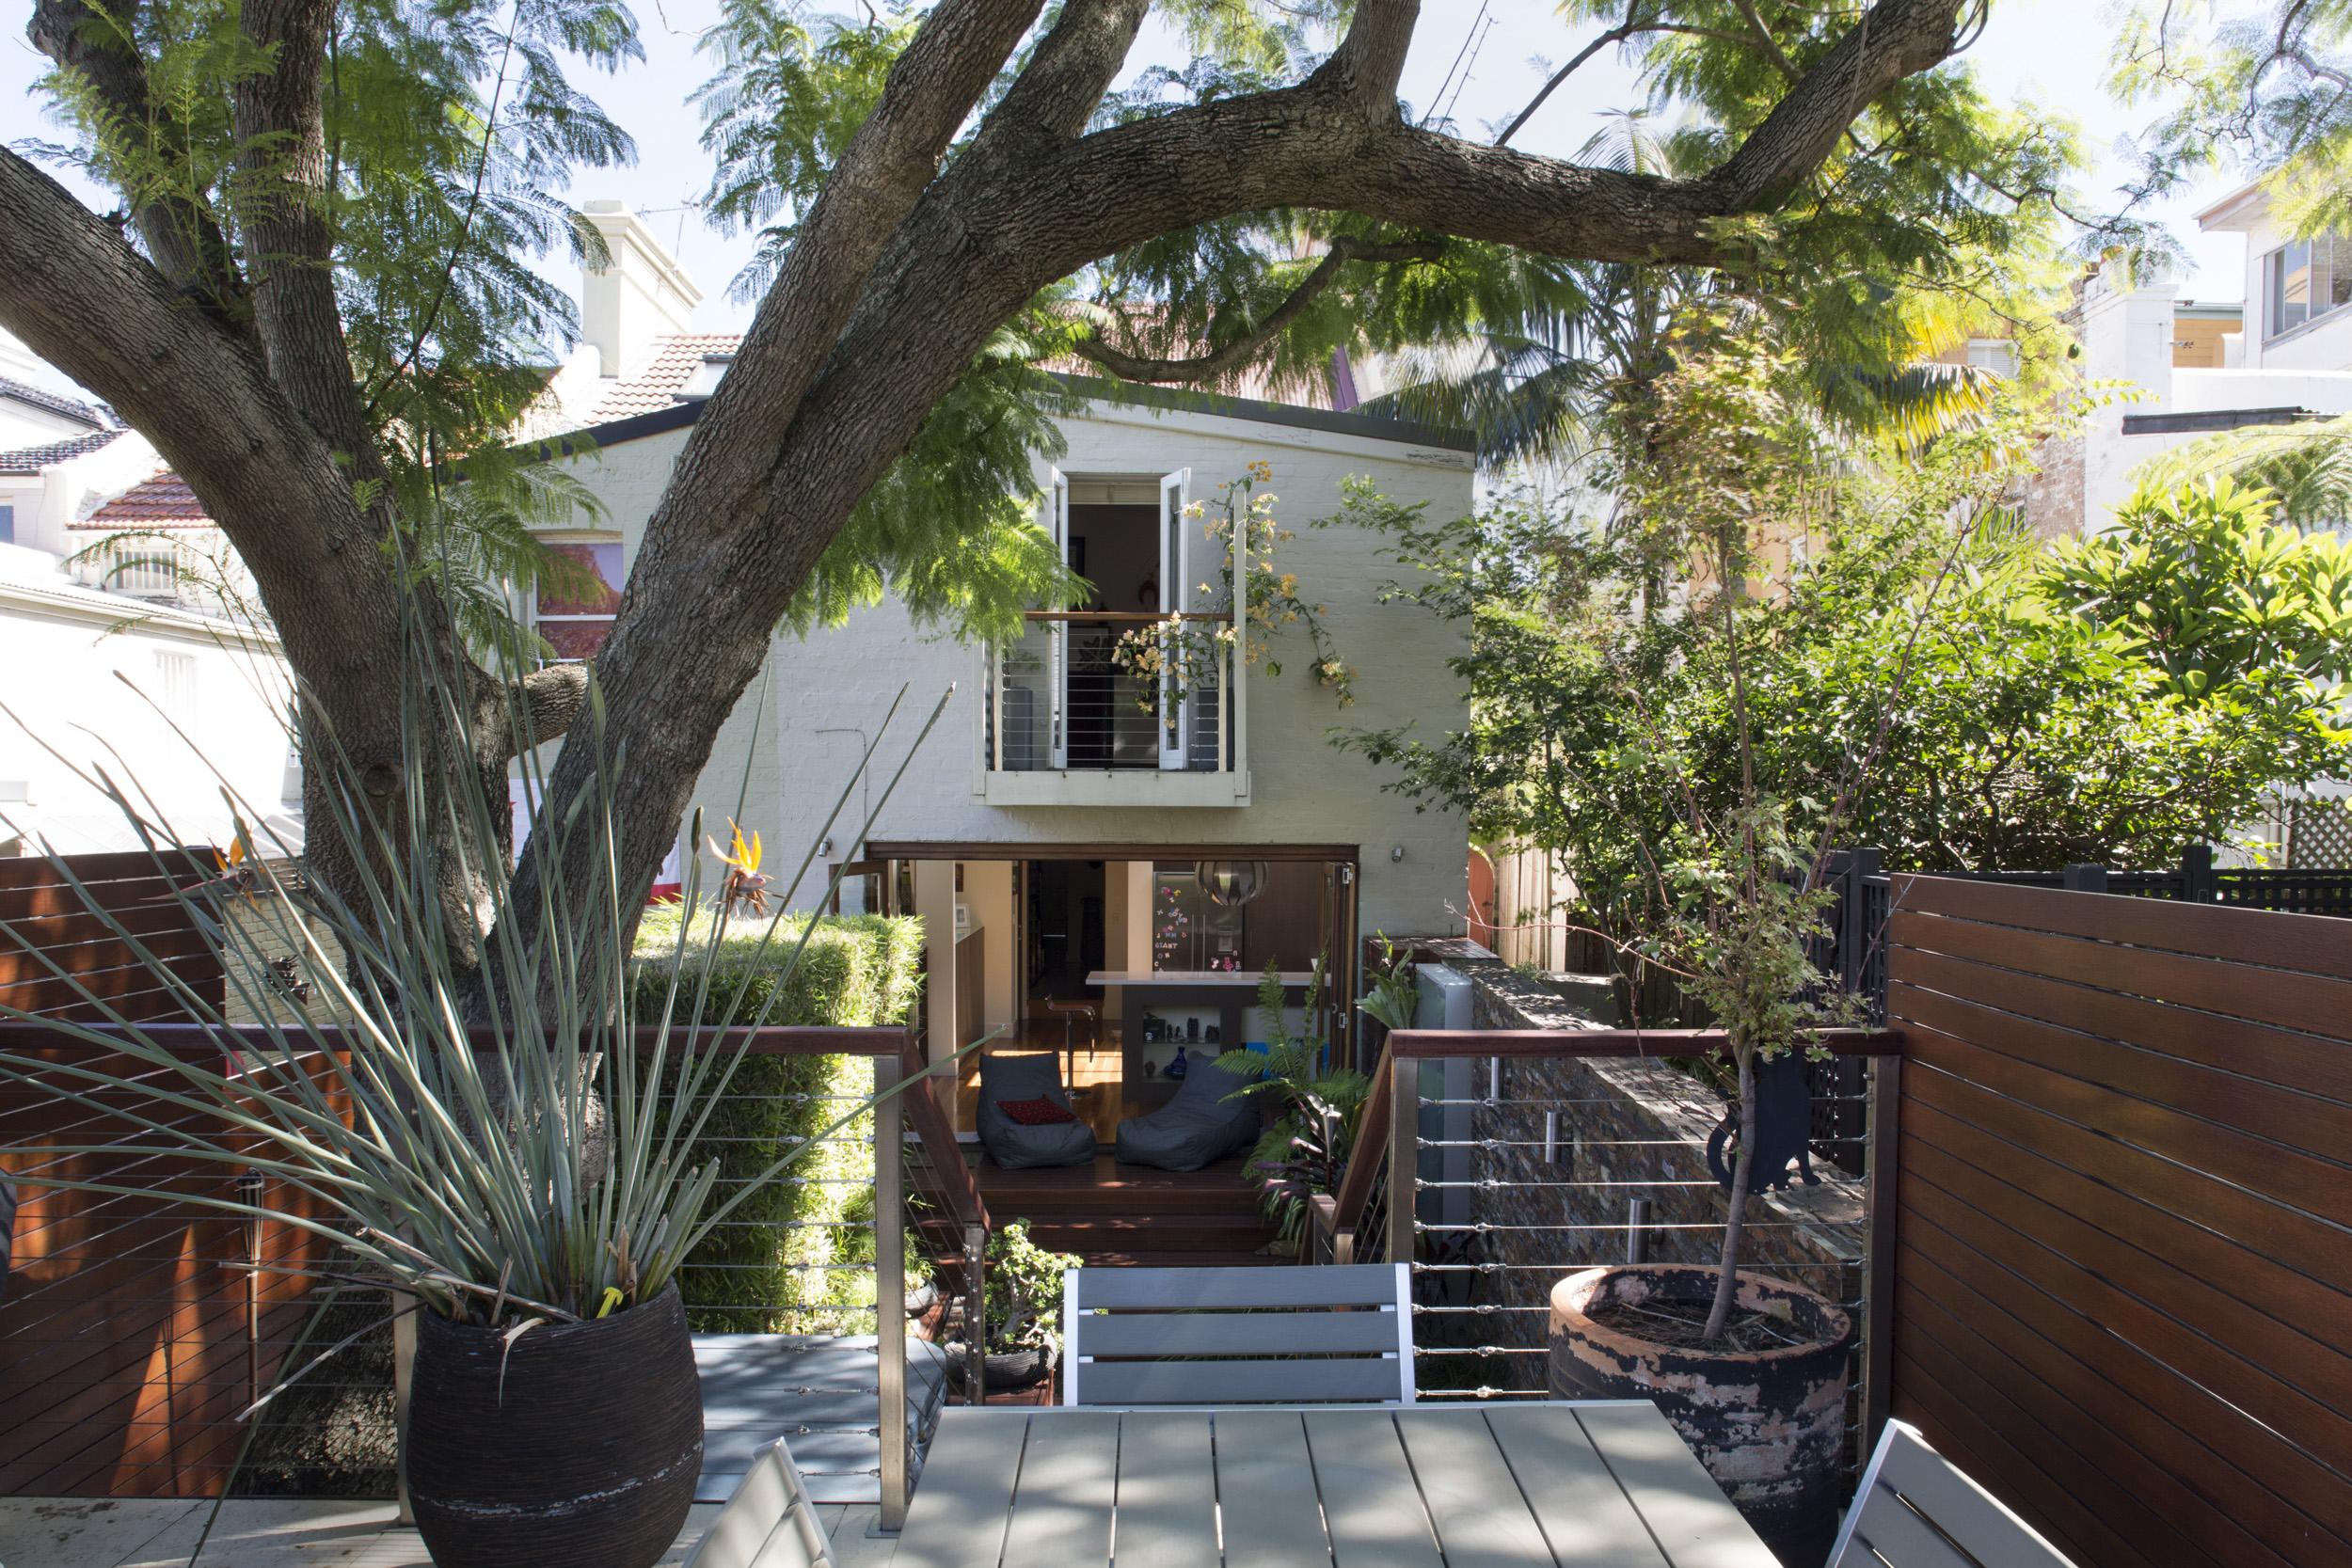 residential_architecture_sydney_australia_15.jpg